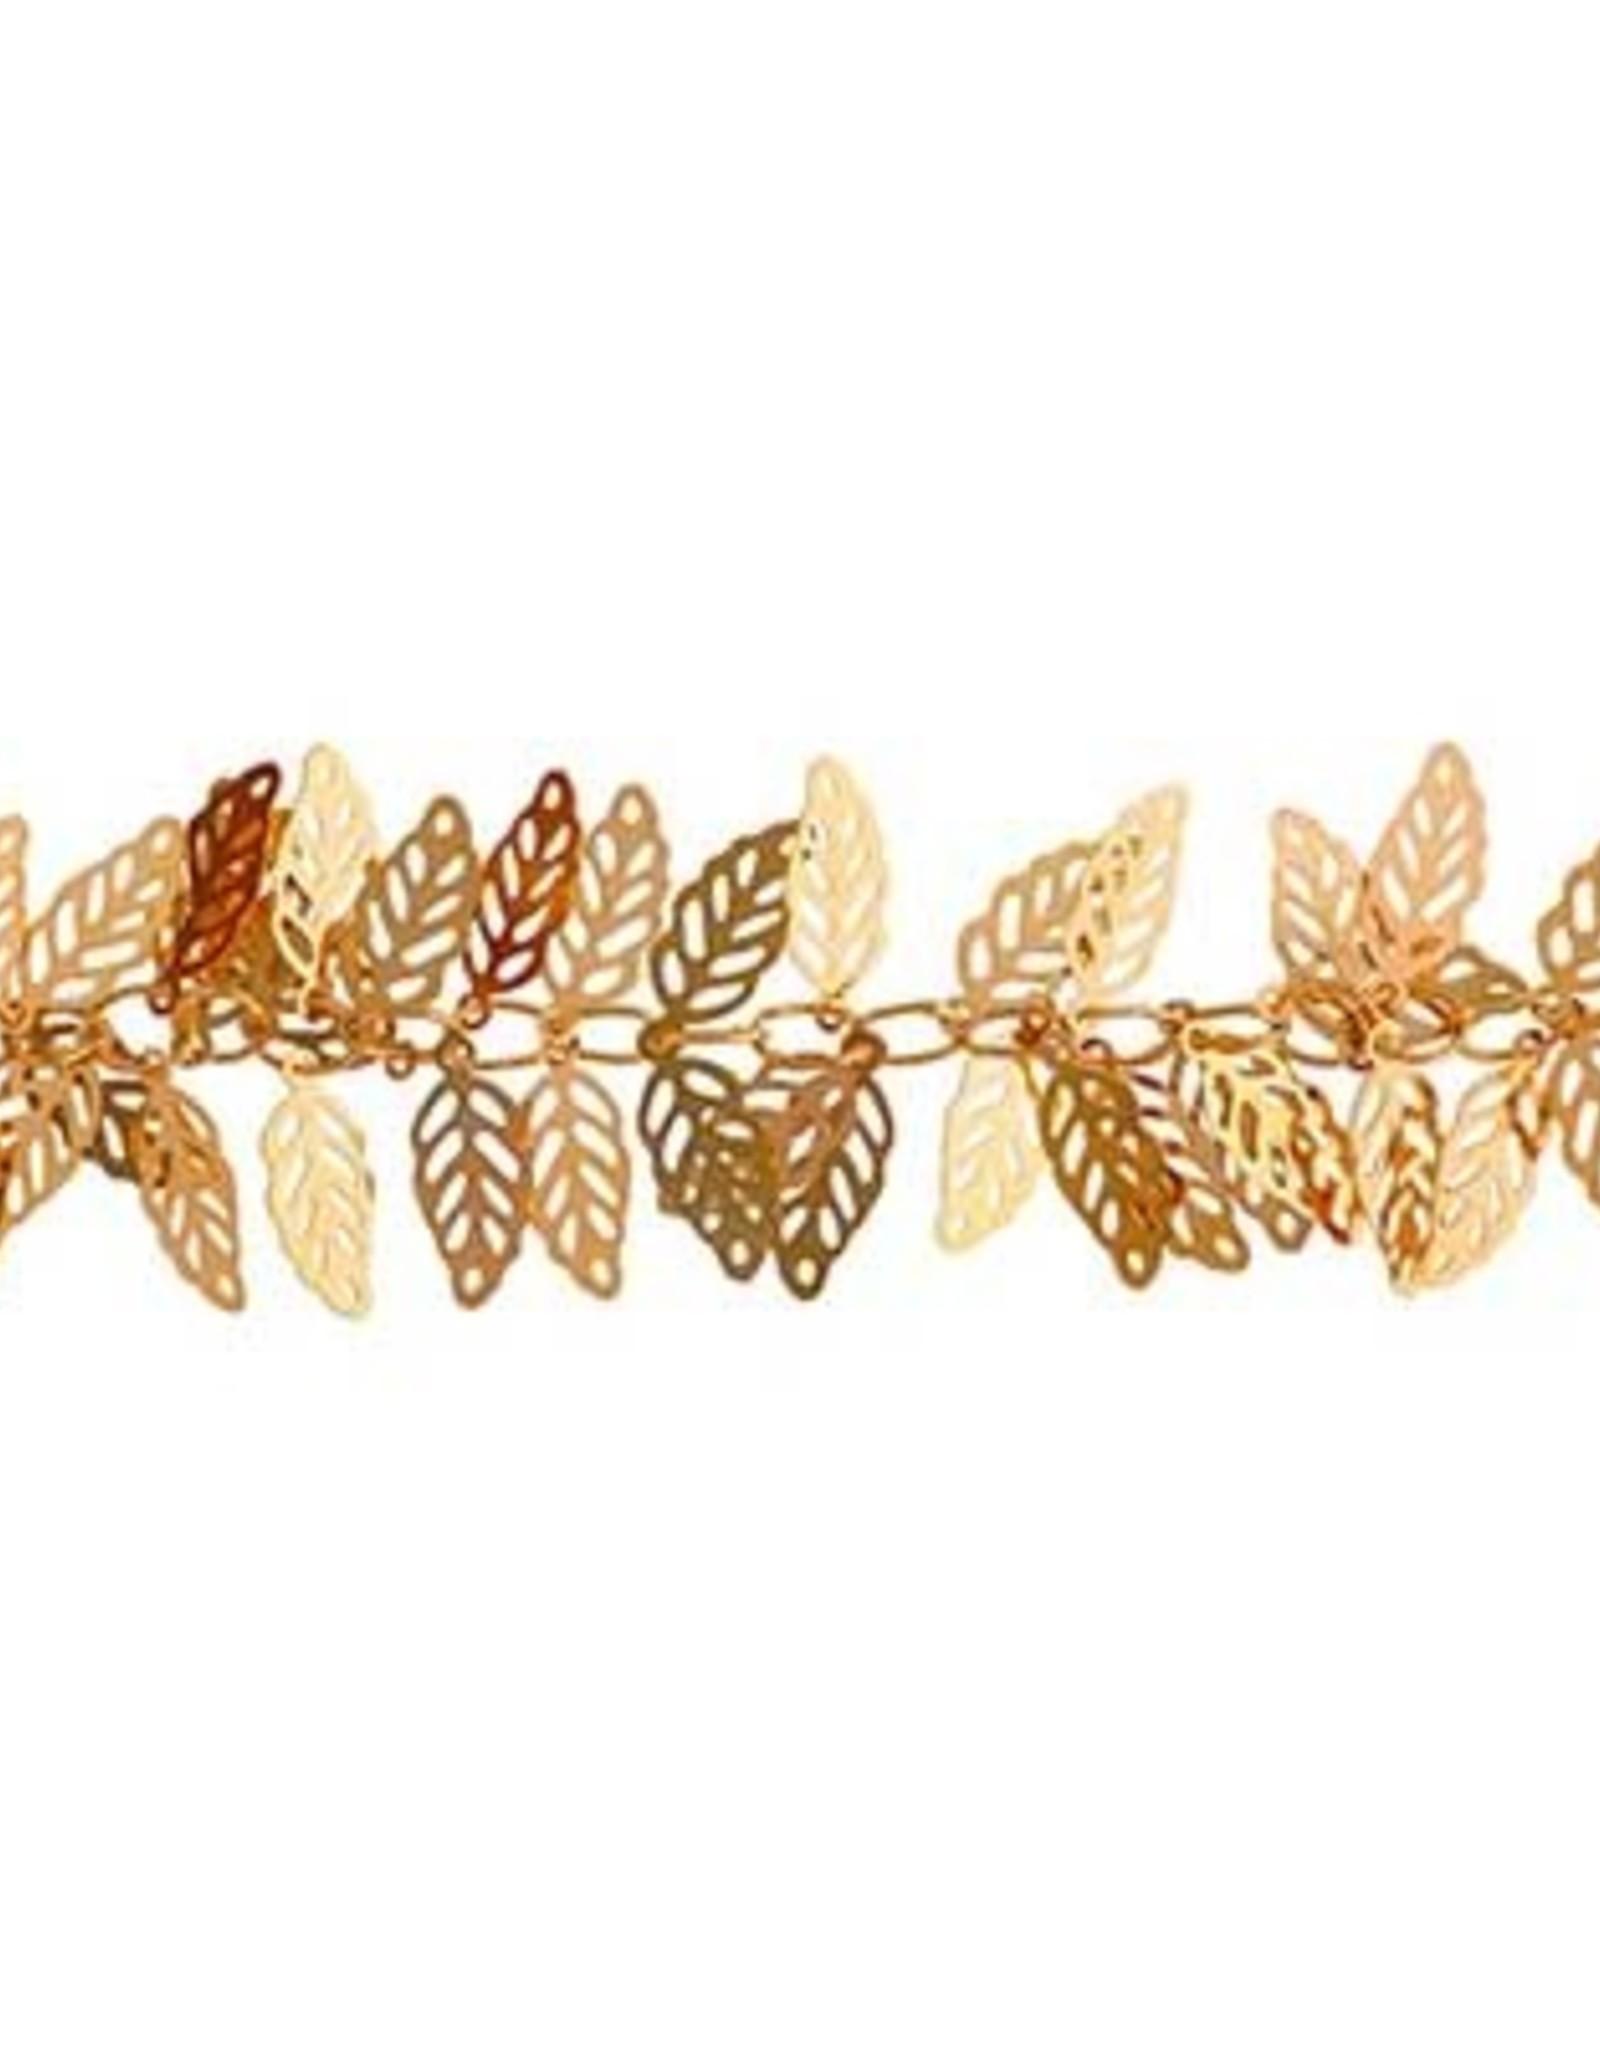 Brass Metal Chain 5x12 mm Leave 5 meters